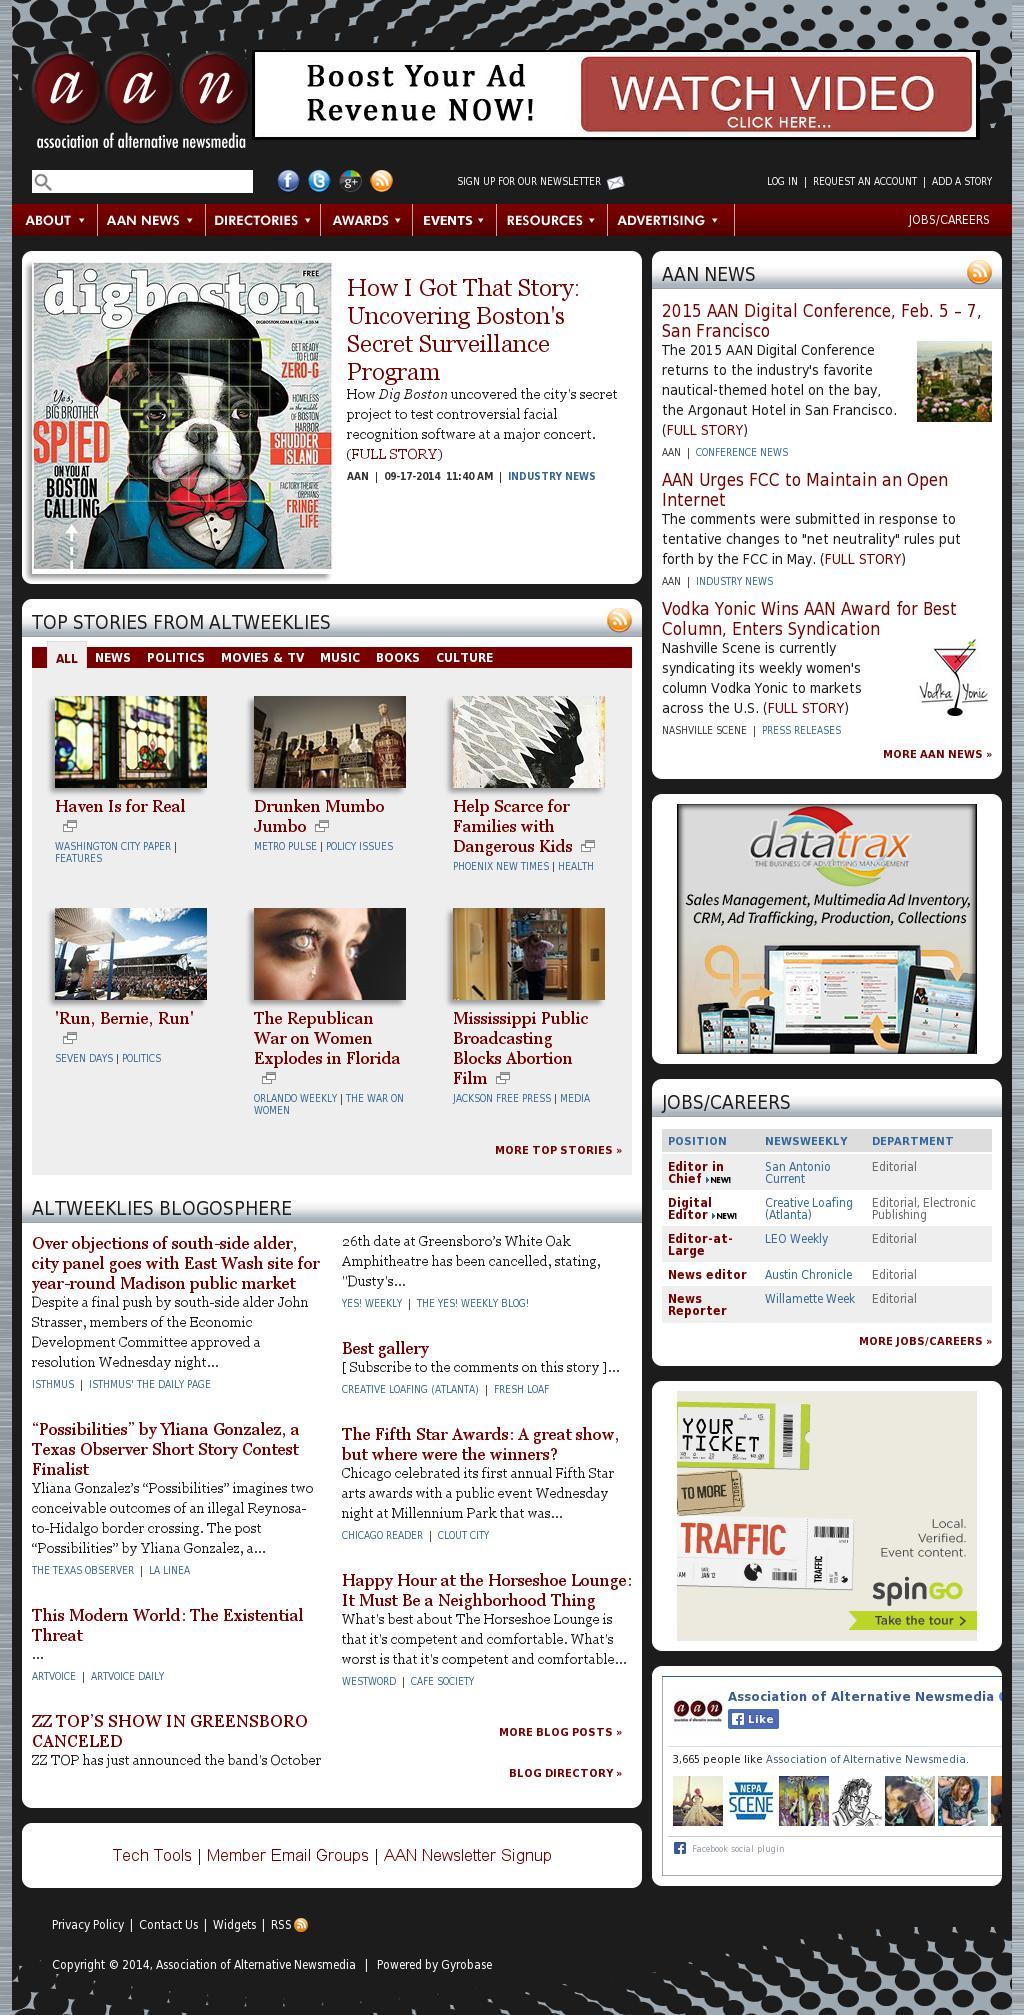 Association of Alternative Newsmedia at Thursday Sept. 18, 2014, 11 p.m. UTC